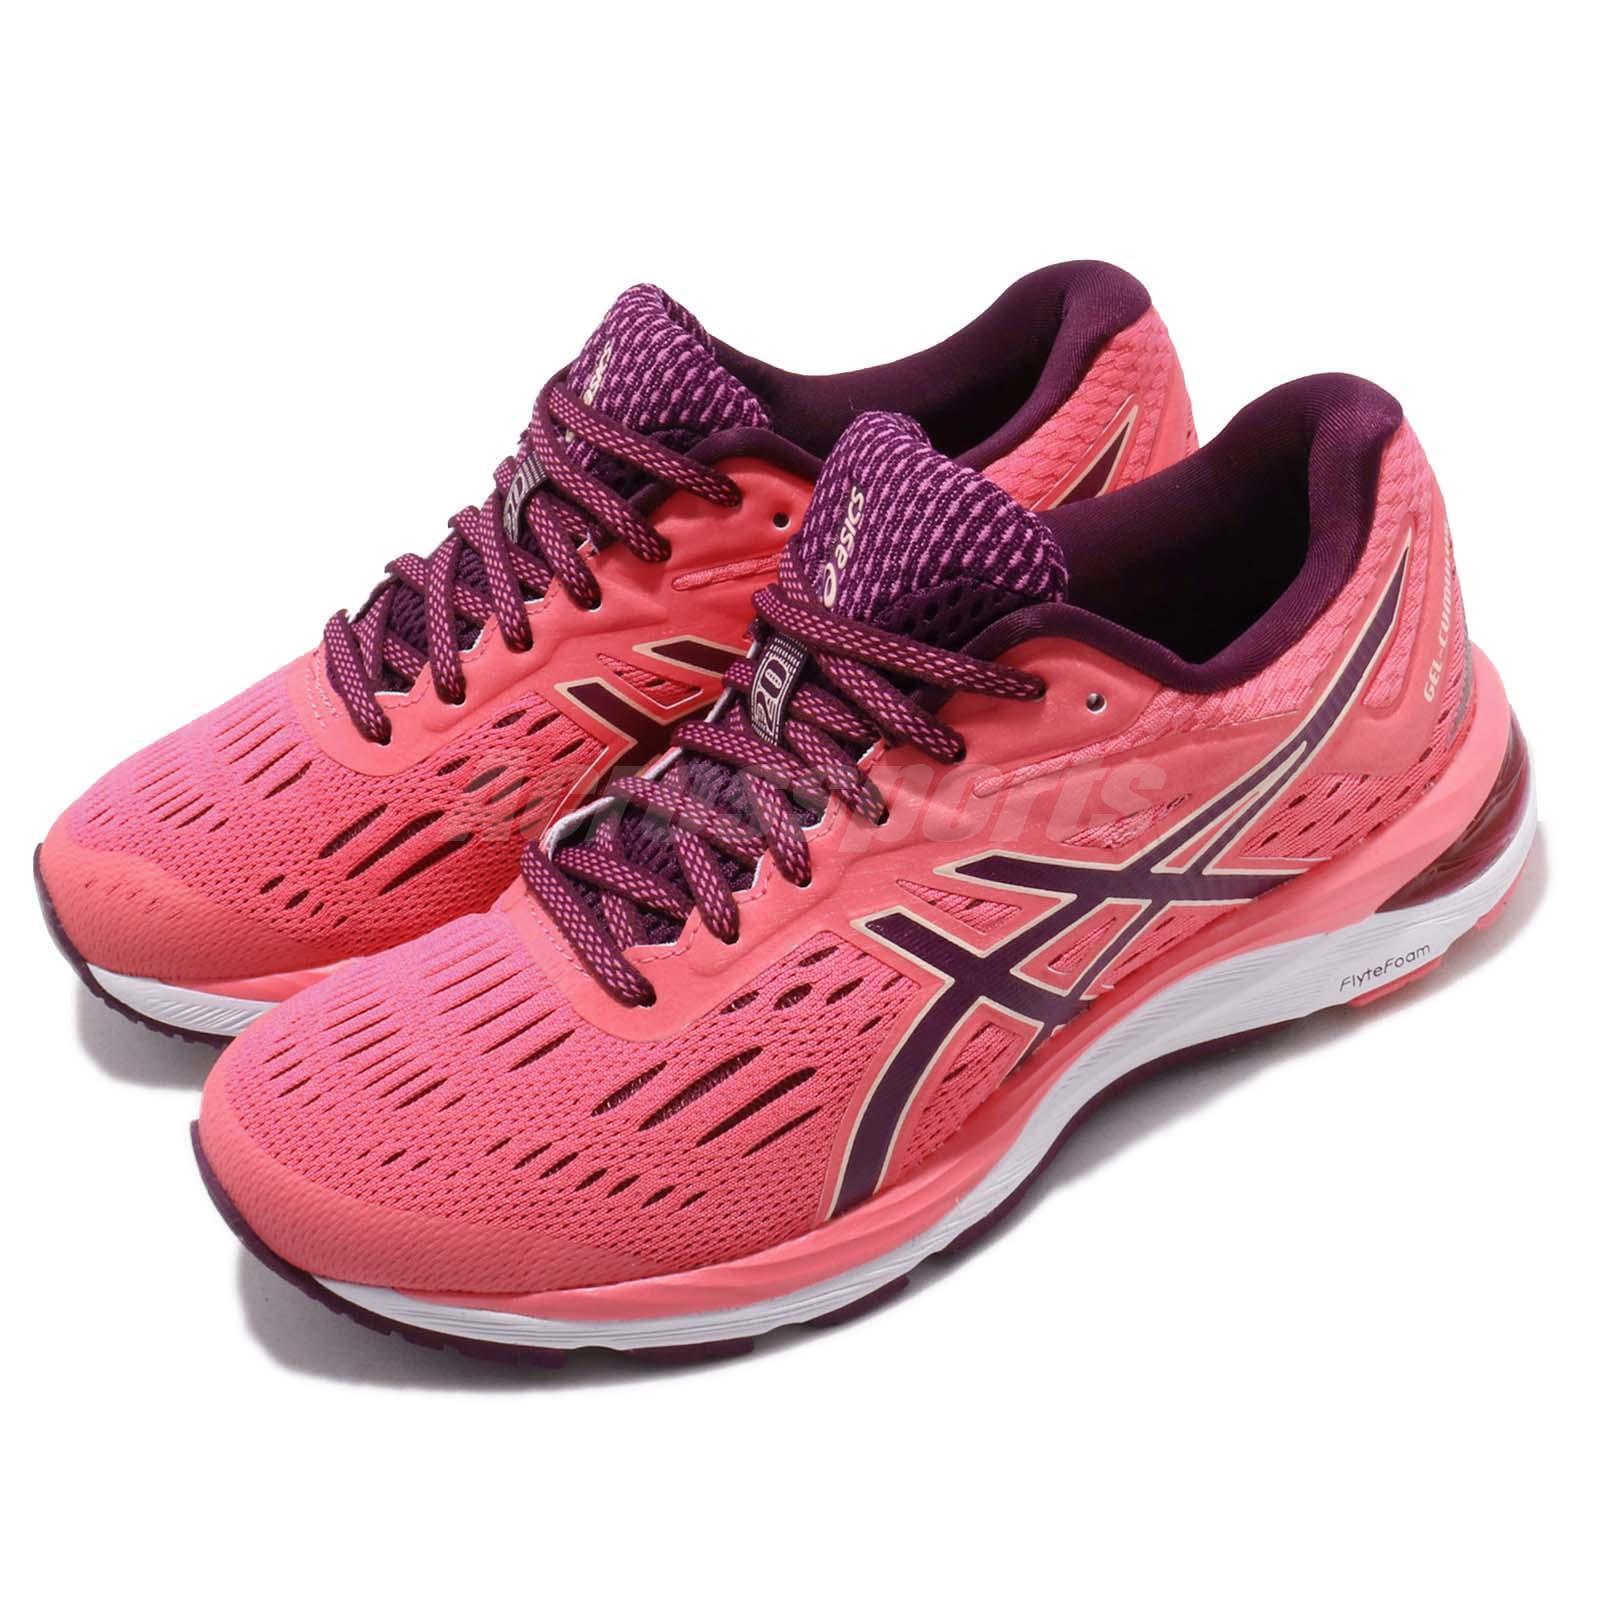 Asics Gel Cumulus 20 Pink Cameo pinklle Women Running shoes Sneaker 1012A008-700